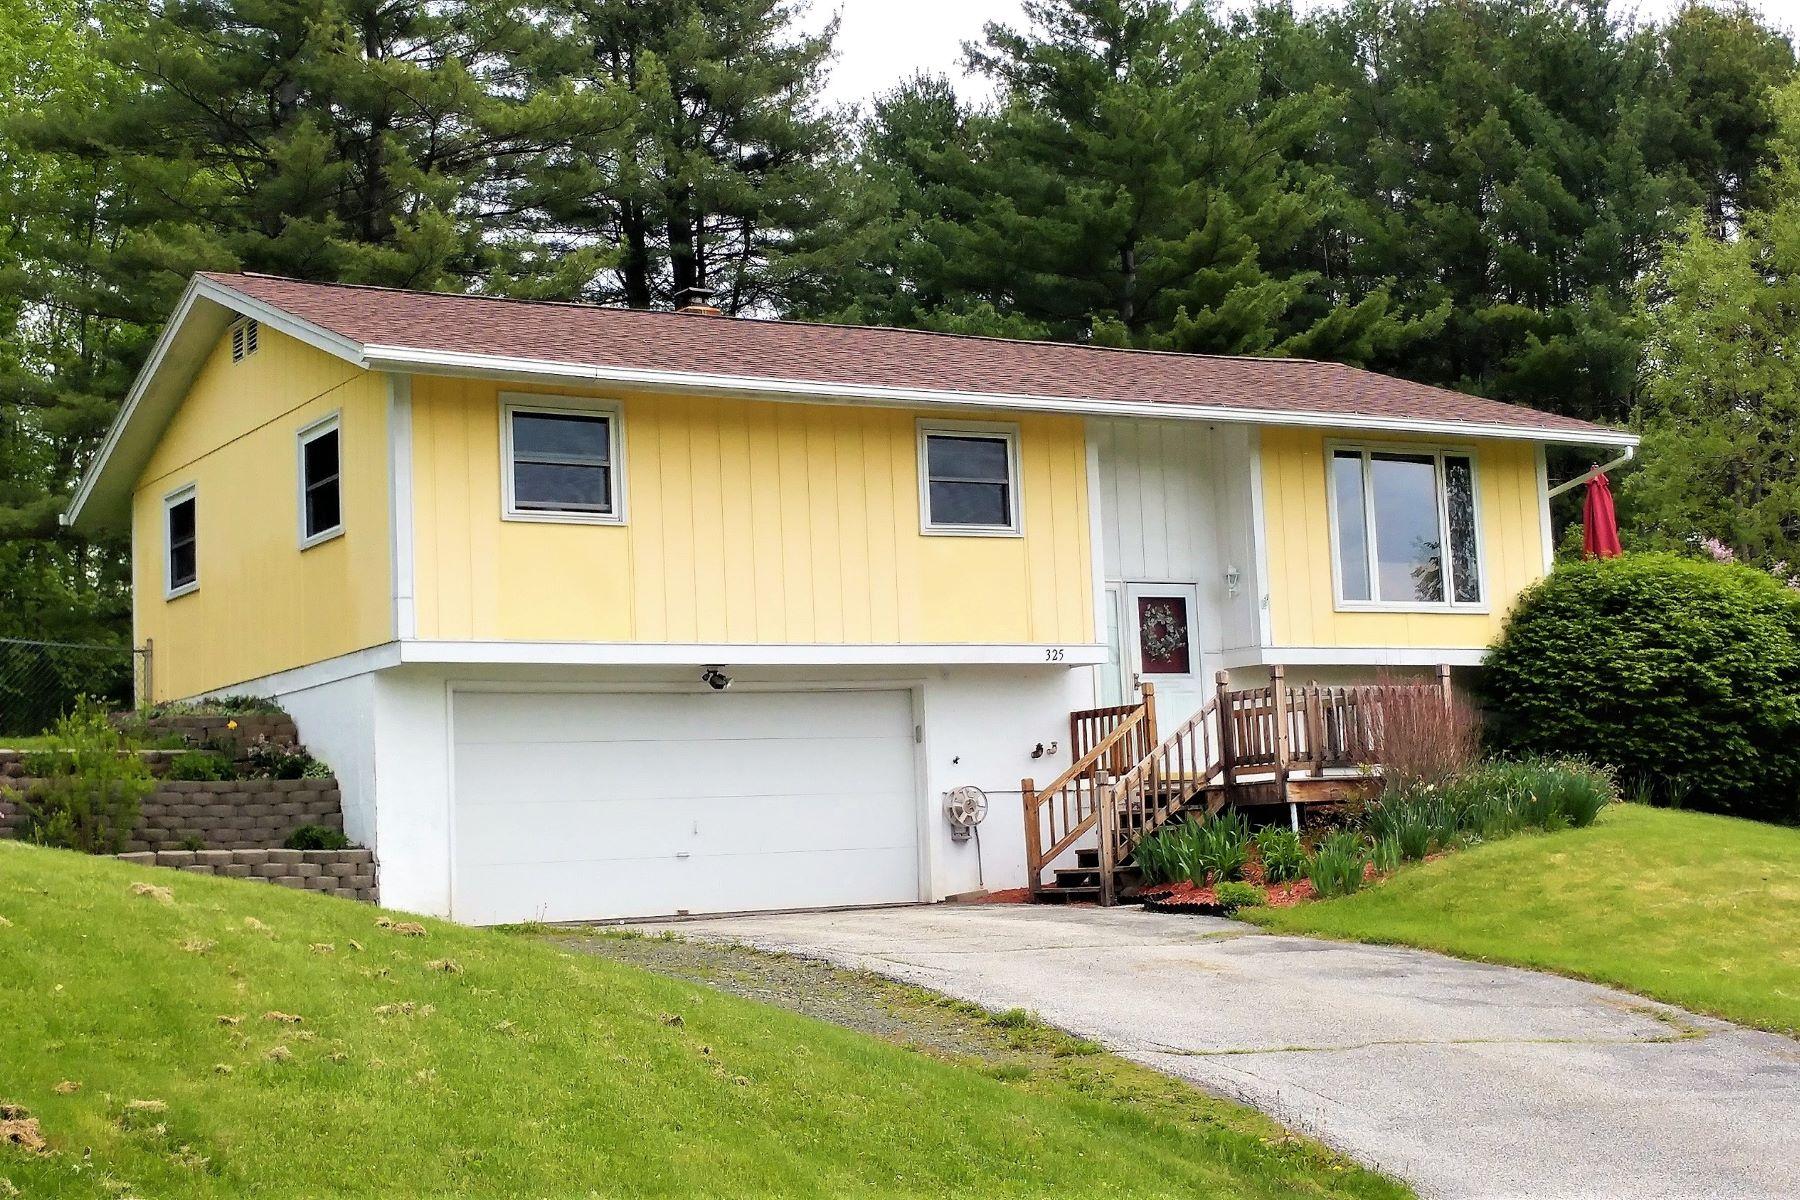 Moradia para Venda às Three bedroom home in Montpelier 325 Sherwood Dr Montpelier, Vermont, 05602 Estados Unidos